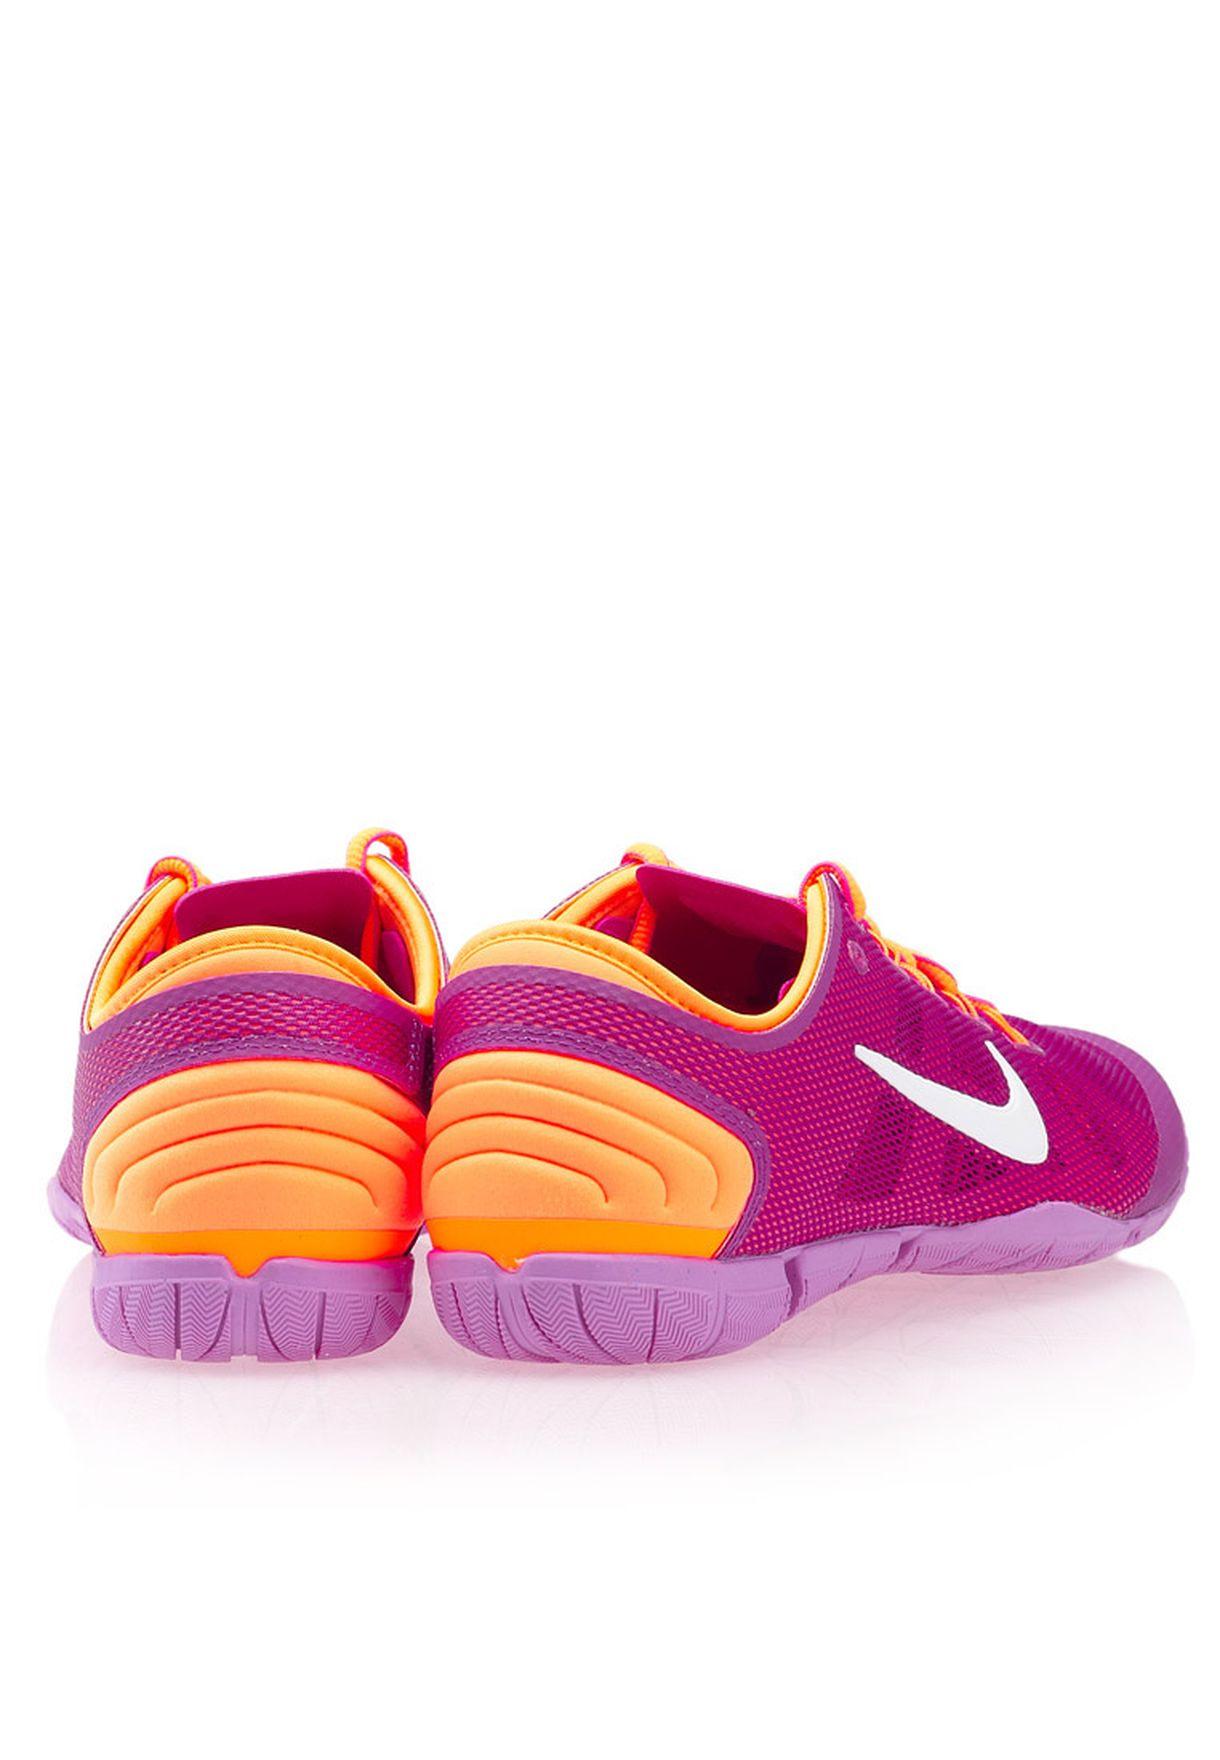 eb3ce6a137 ... australia shop nike pink free bionic 599269 501 for women in oman 3edb8  4ea8e